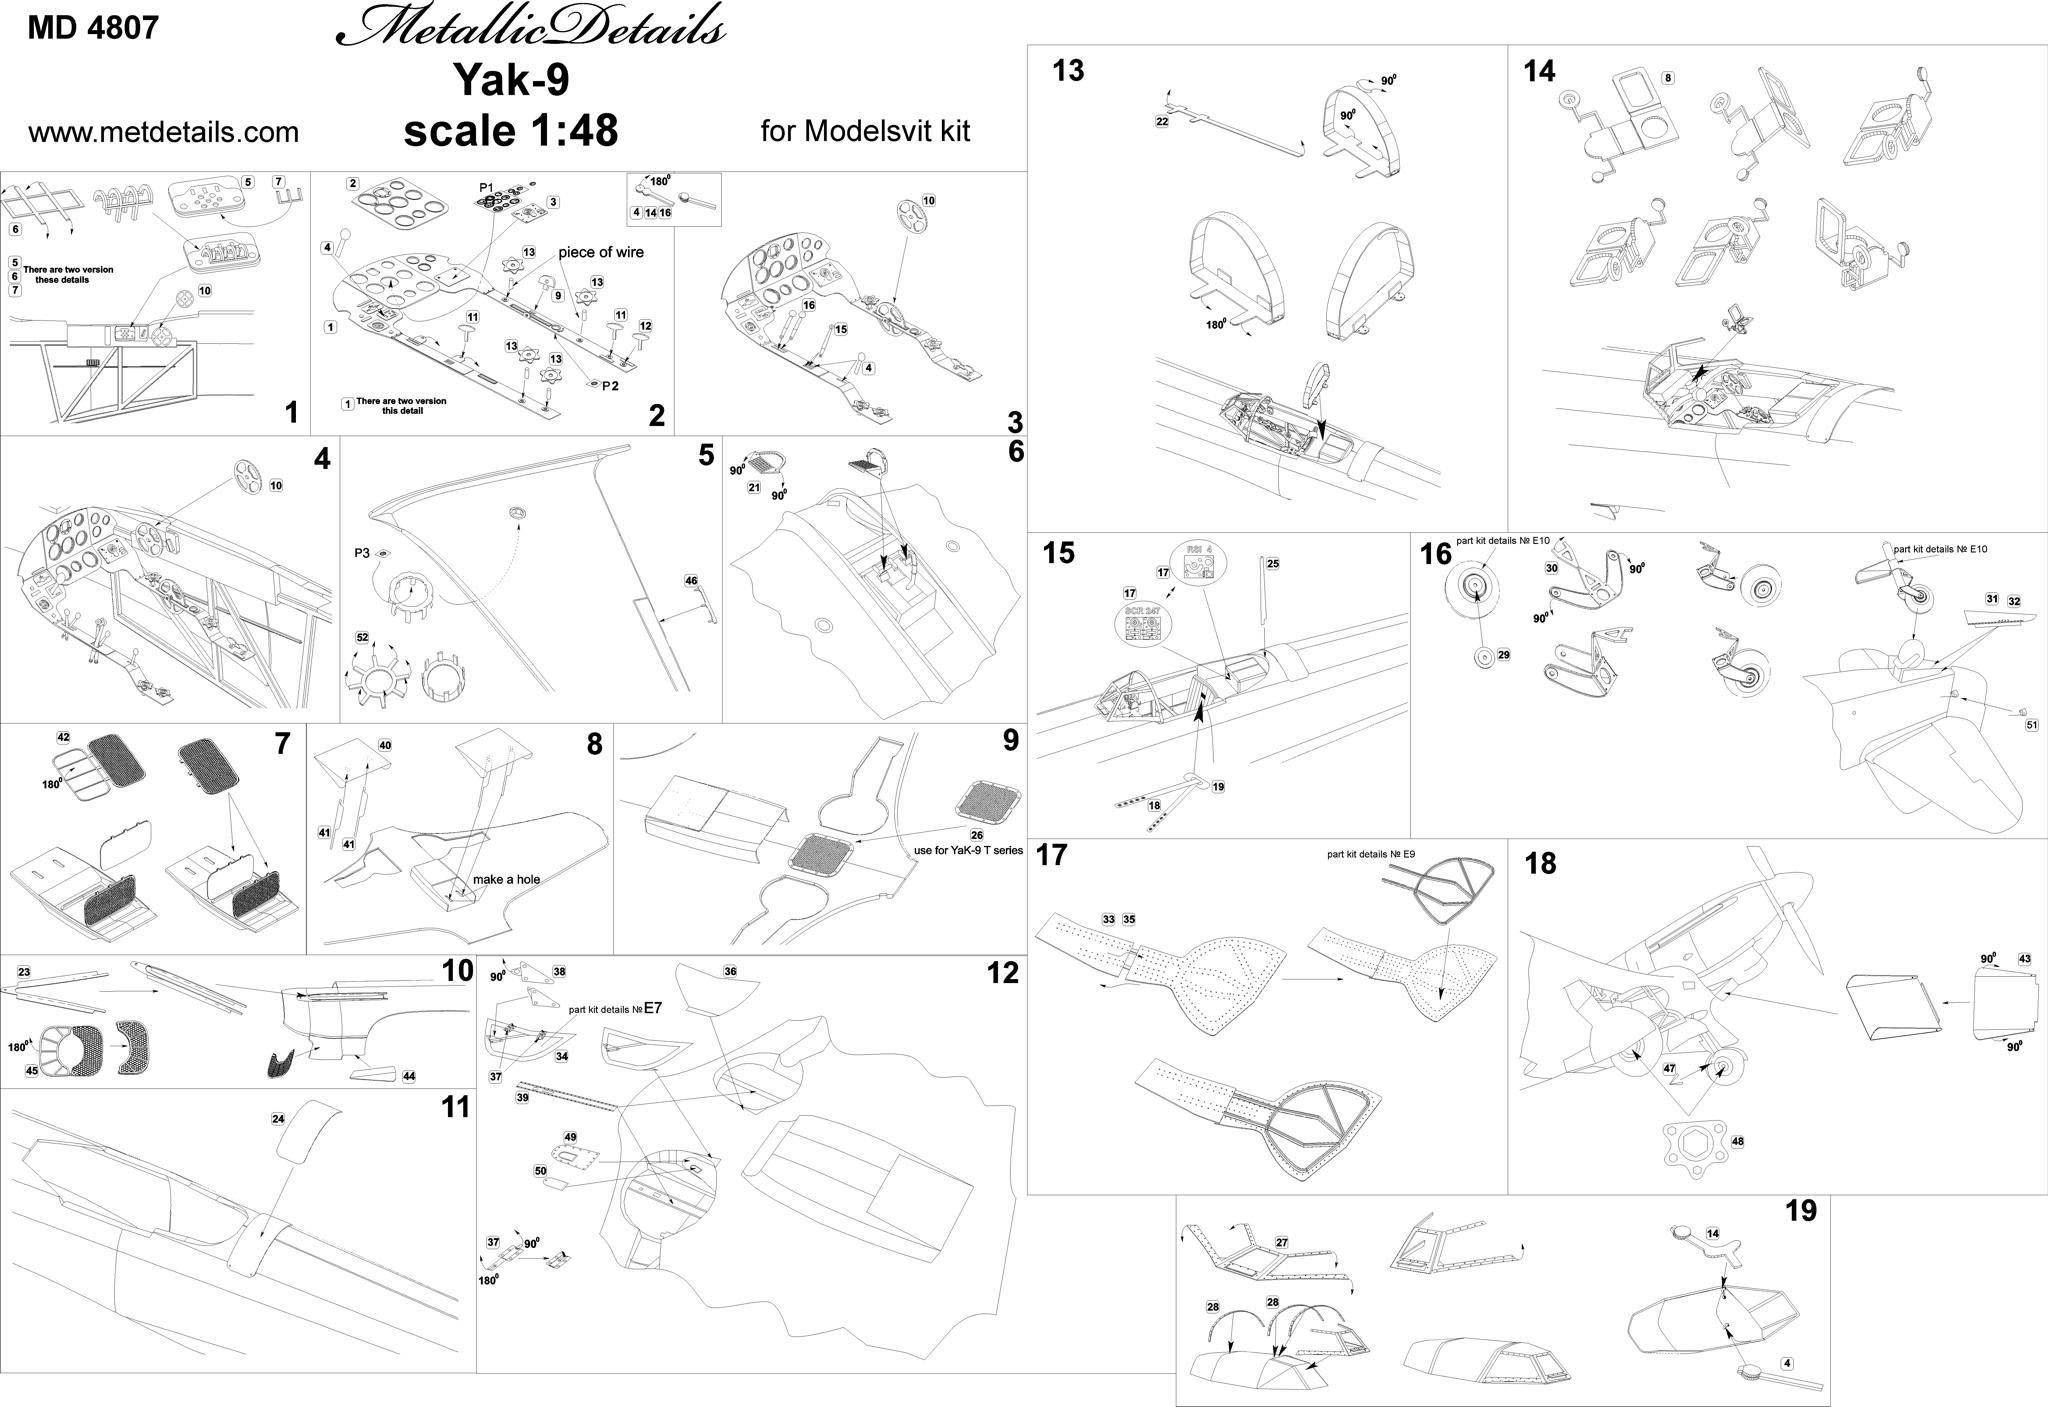 yak-9_instruction.jpg